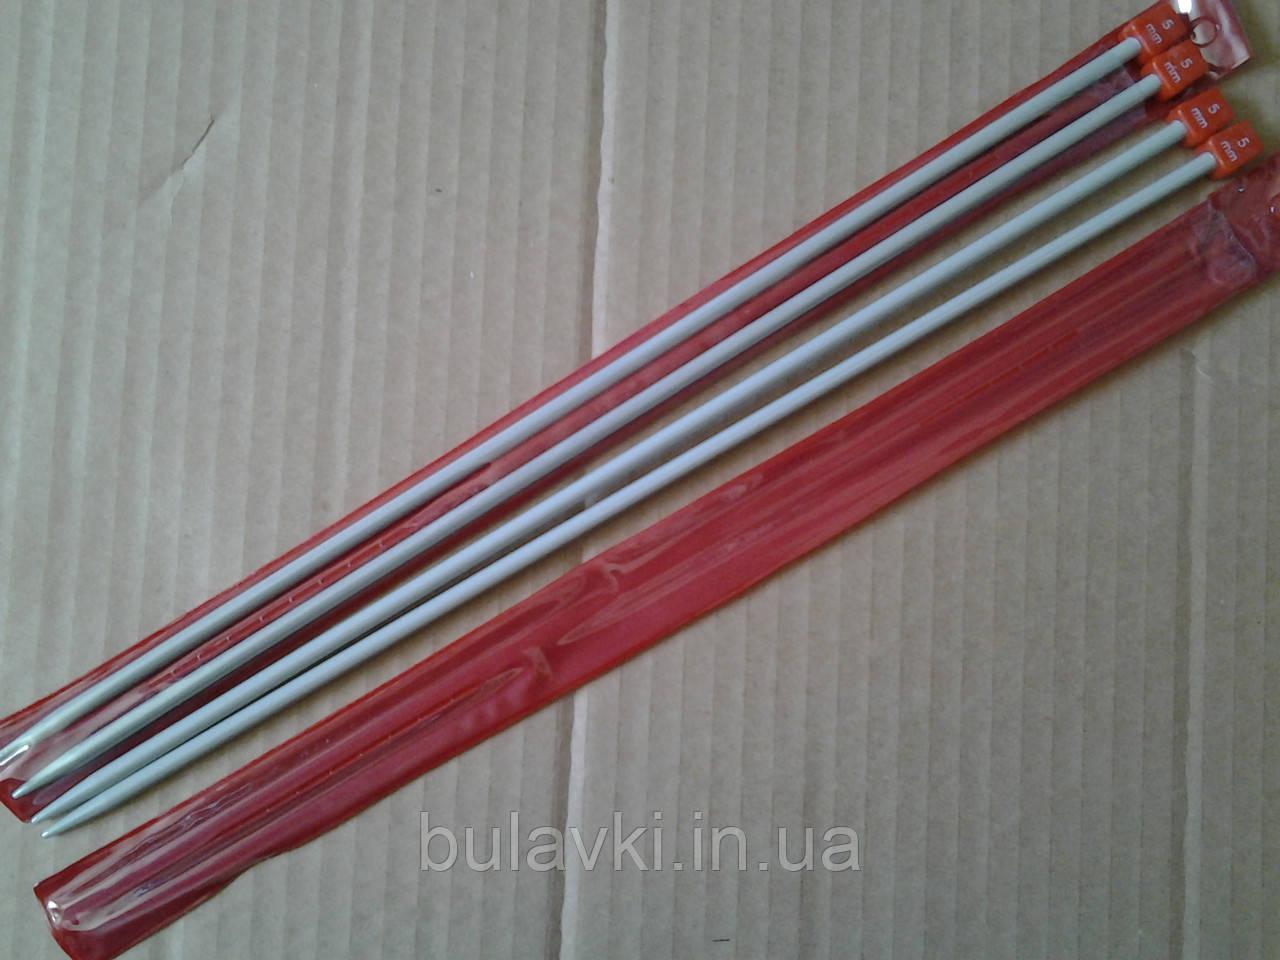 Спица прямая вязальная тефлоновая 5мм